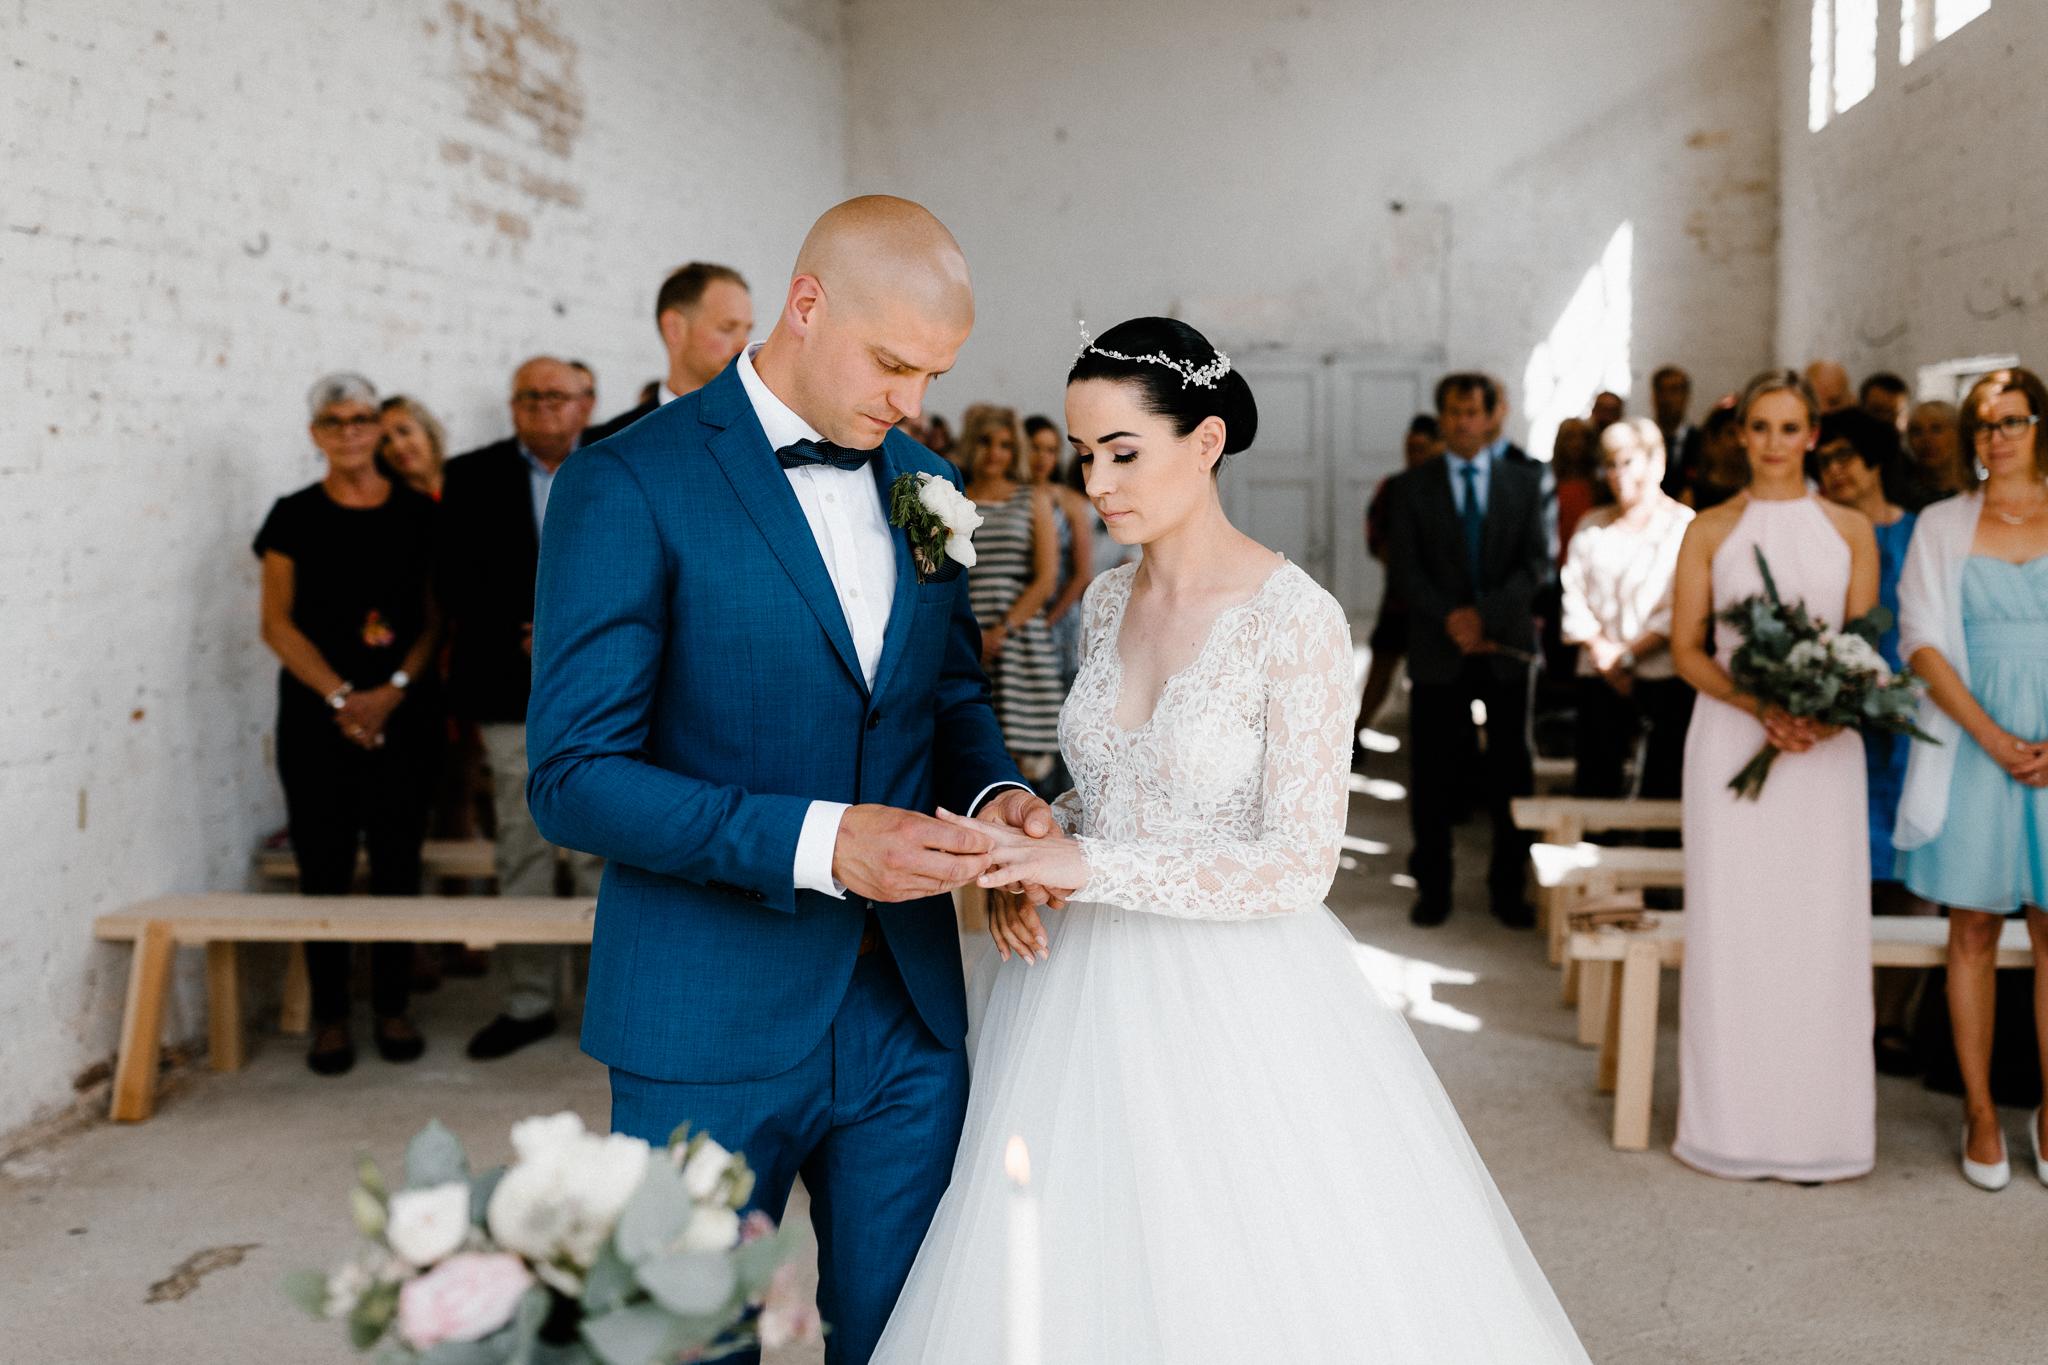 Essi + Ville   Oitbacka Gården   by Patrick Karkkolainen Wedding Photography-157.jpg